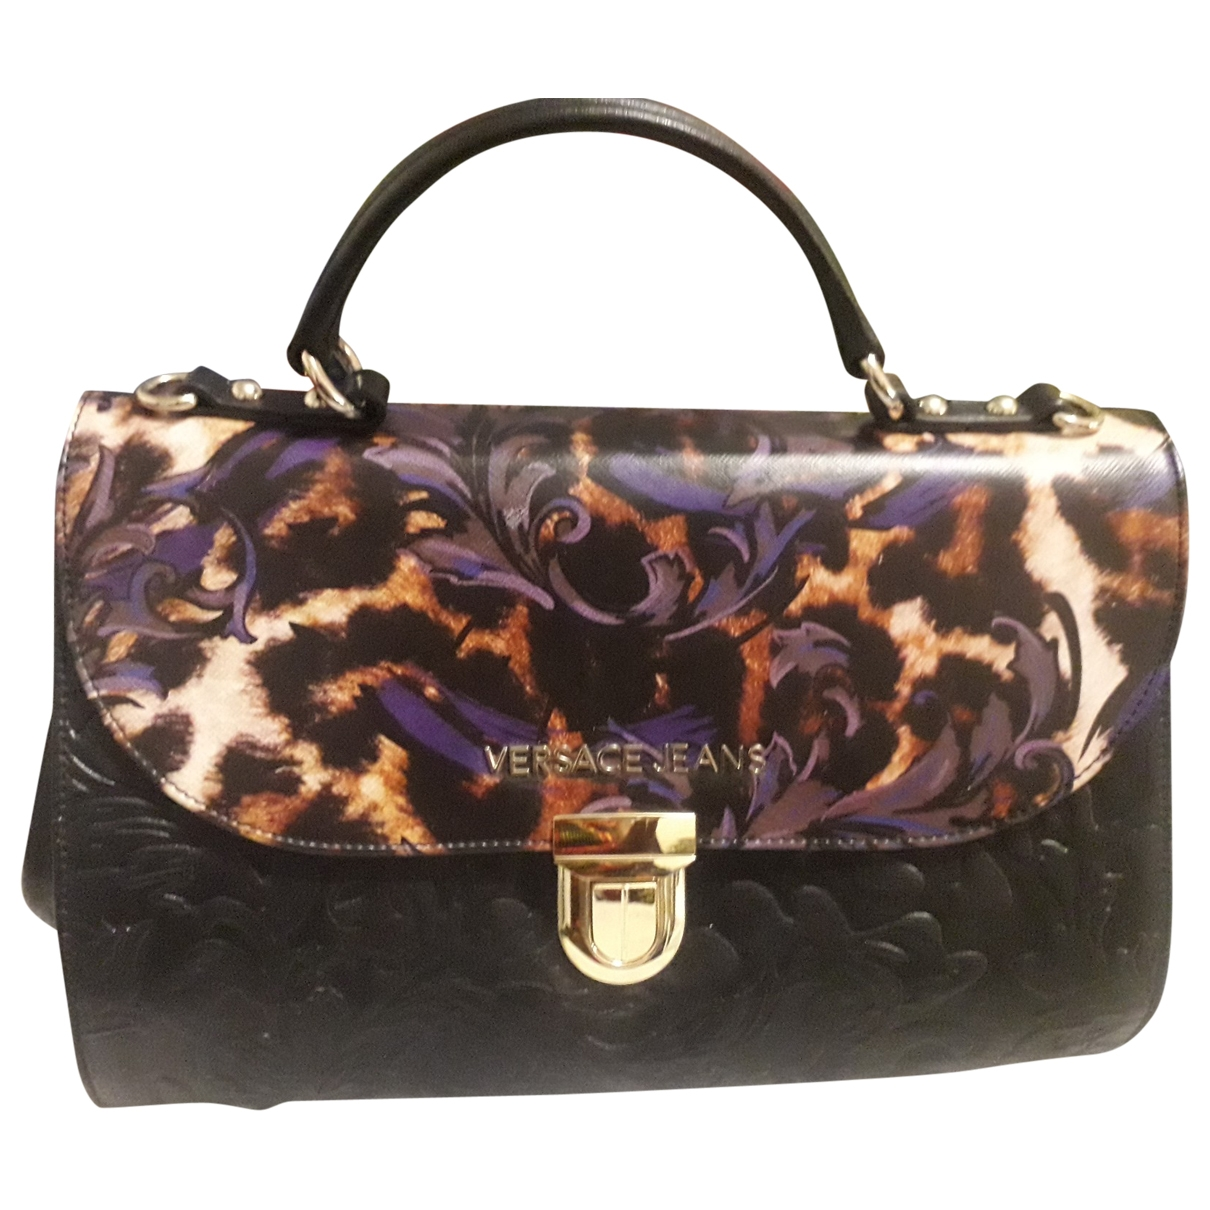 Versace Jeans \N Handtasche in  Schwarz Leder